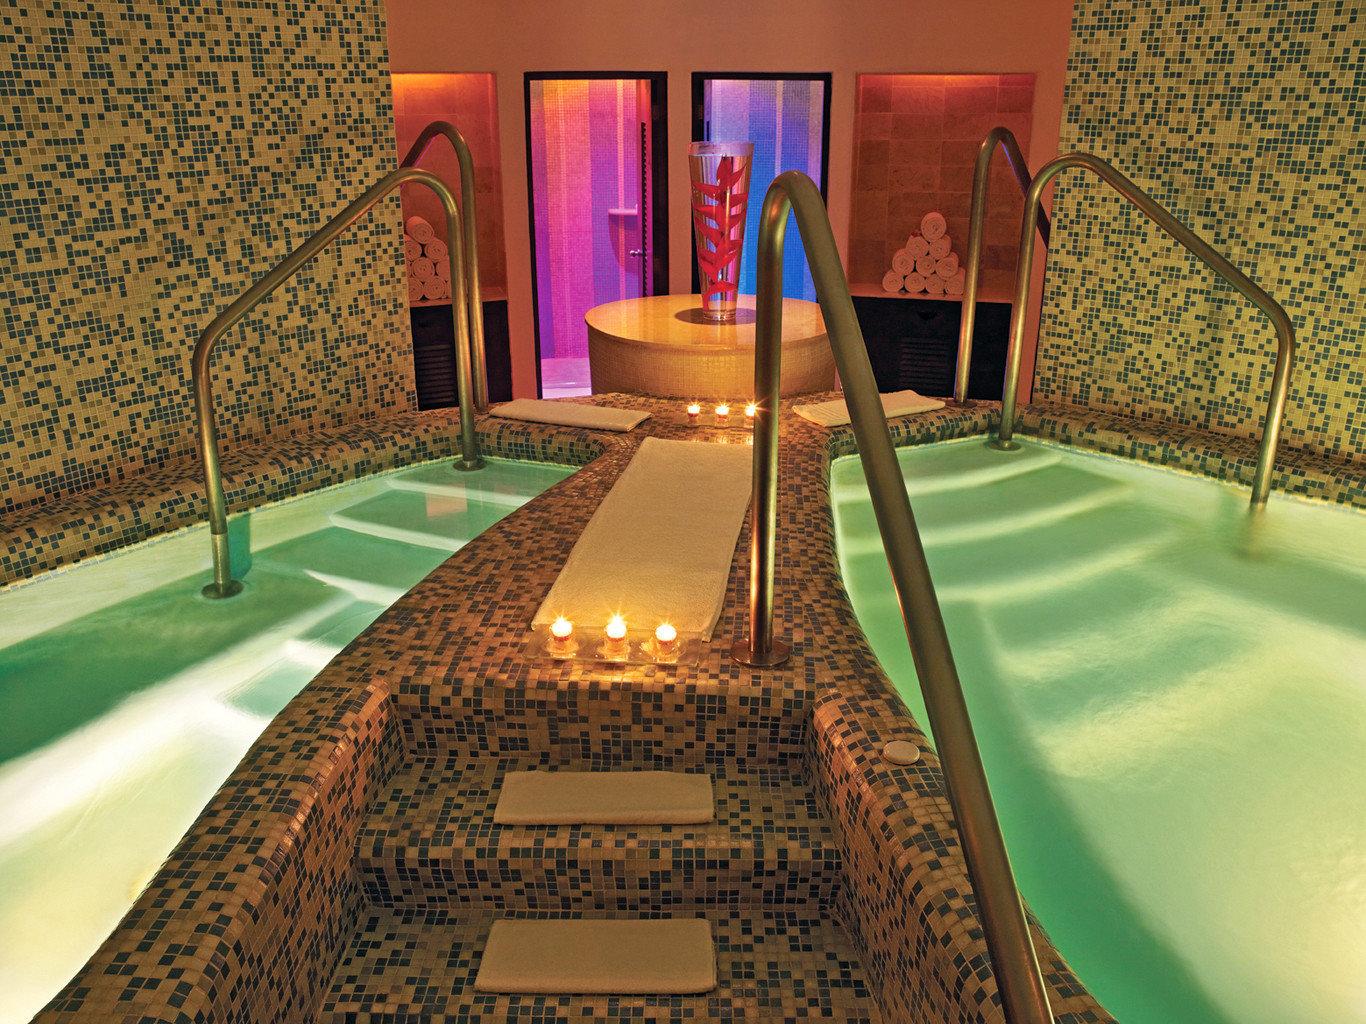 Adult-only All-Inclusive Resorts Cancun Hotels Luxury Mexico Romantic Spa indoor floor swimming pool leisure estate billiard room room recreation room flooring mansion screenshot Resort